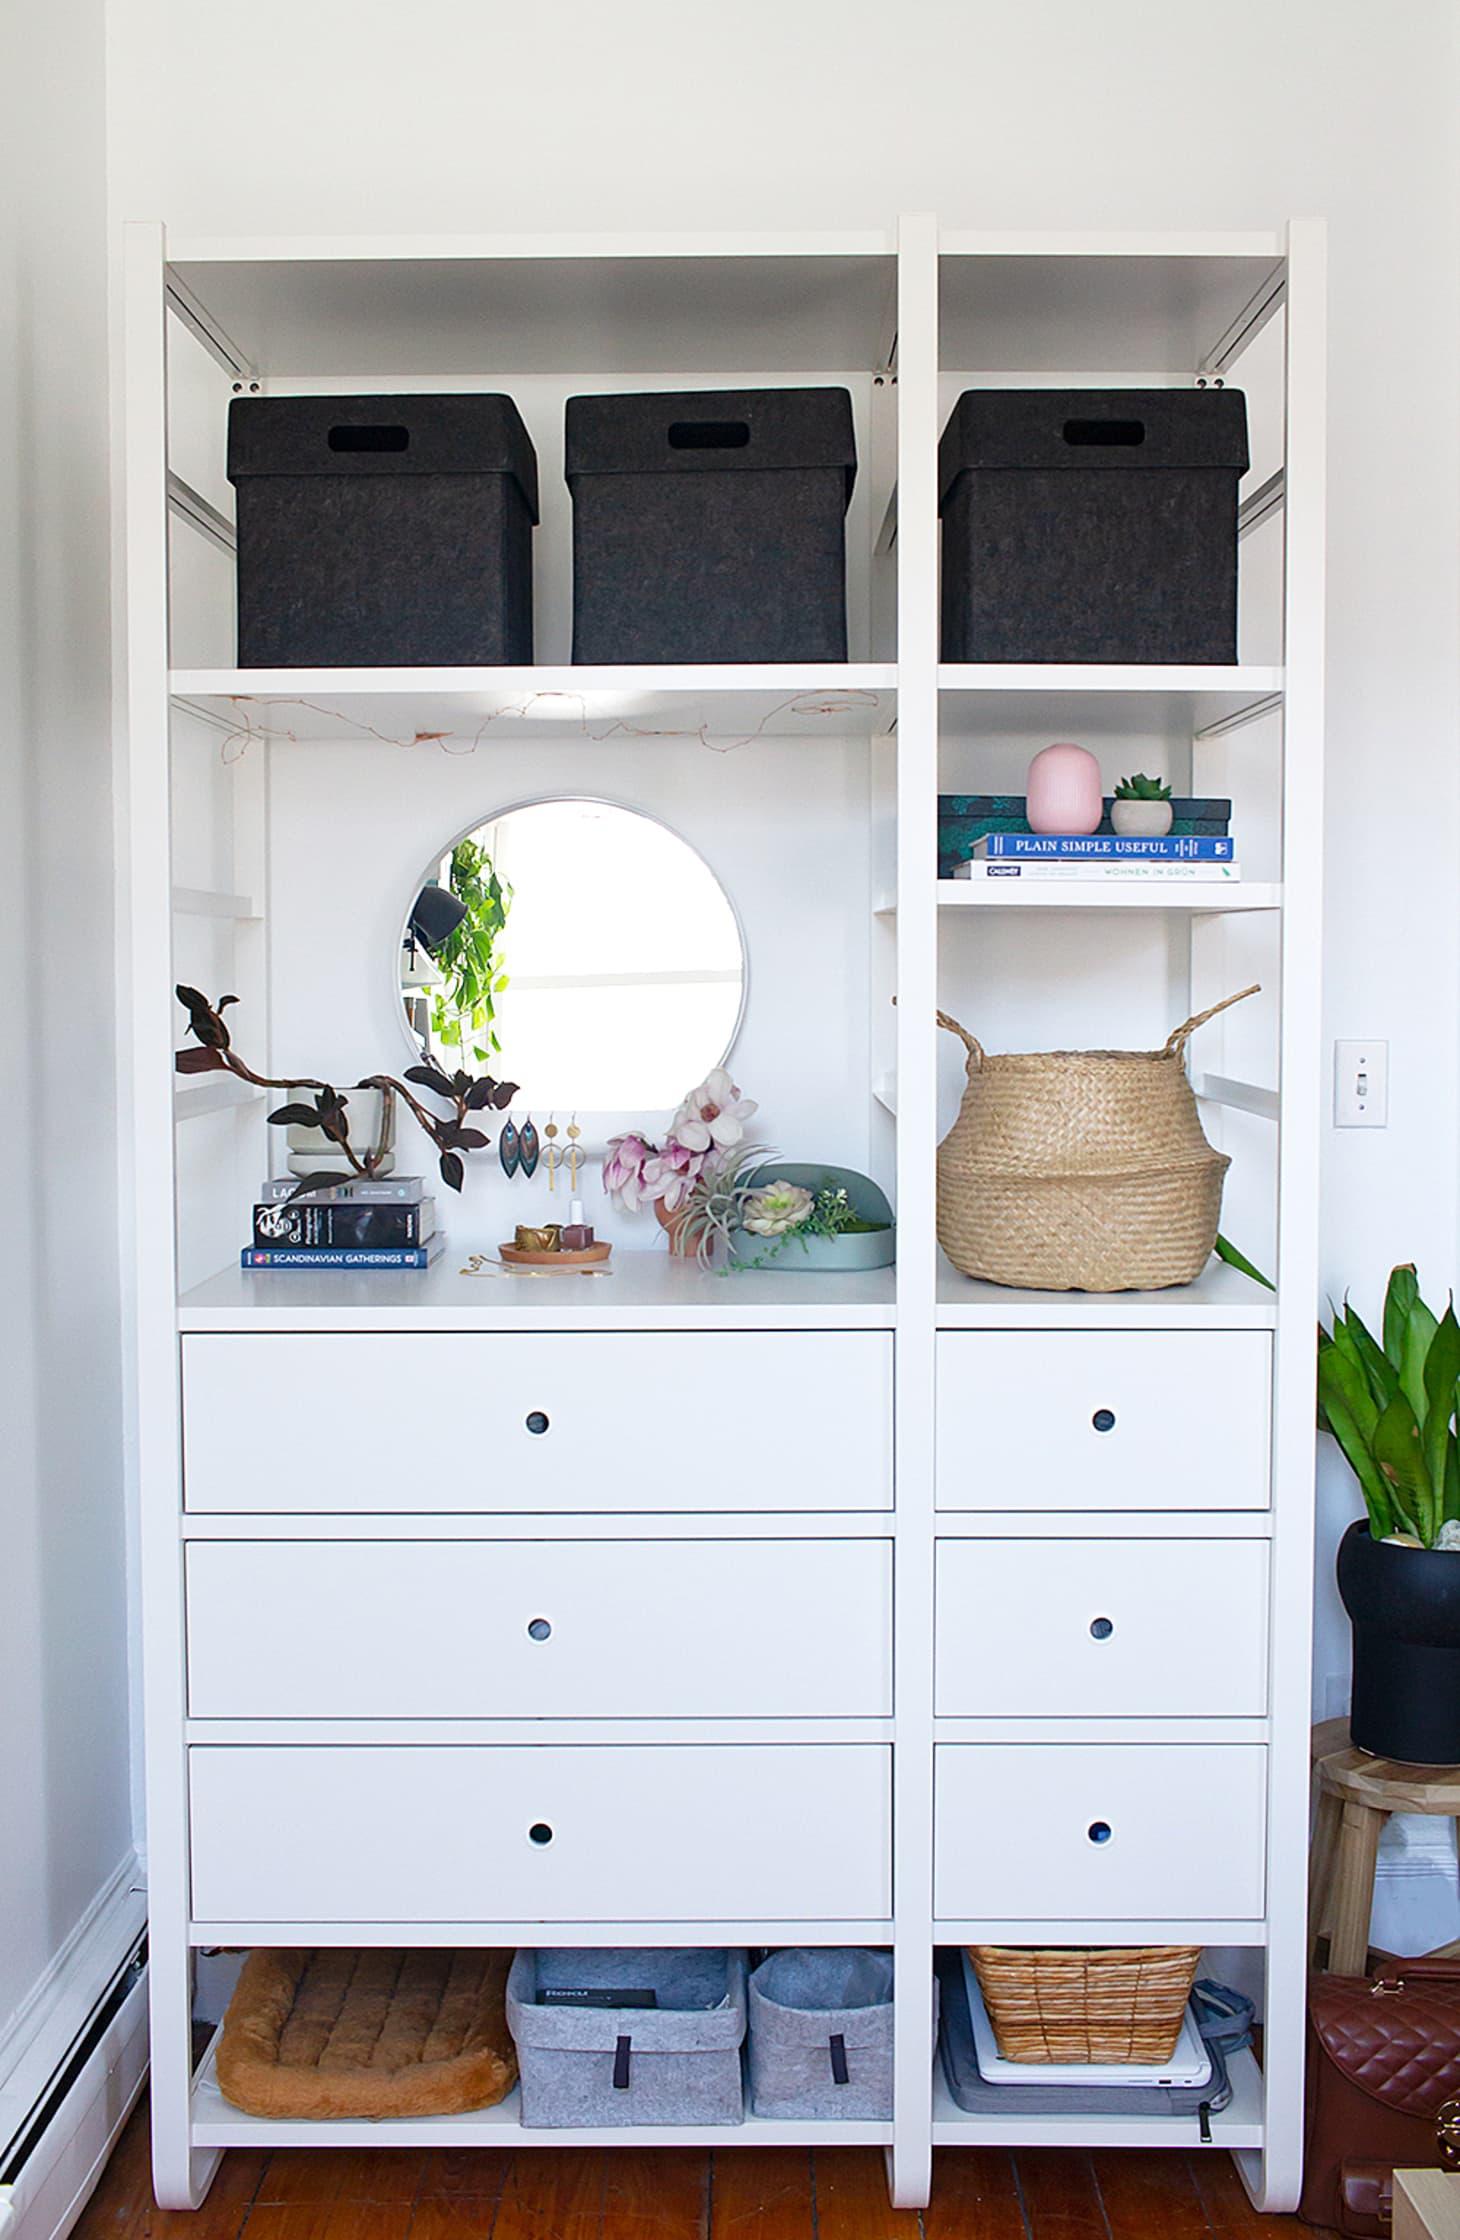 IKEA Storage Hacks for Disorganized People | Apartment Therapy